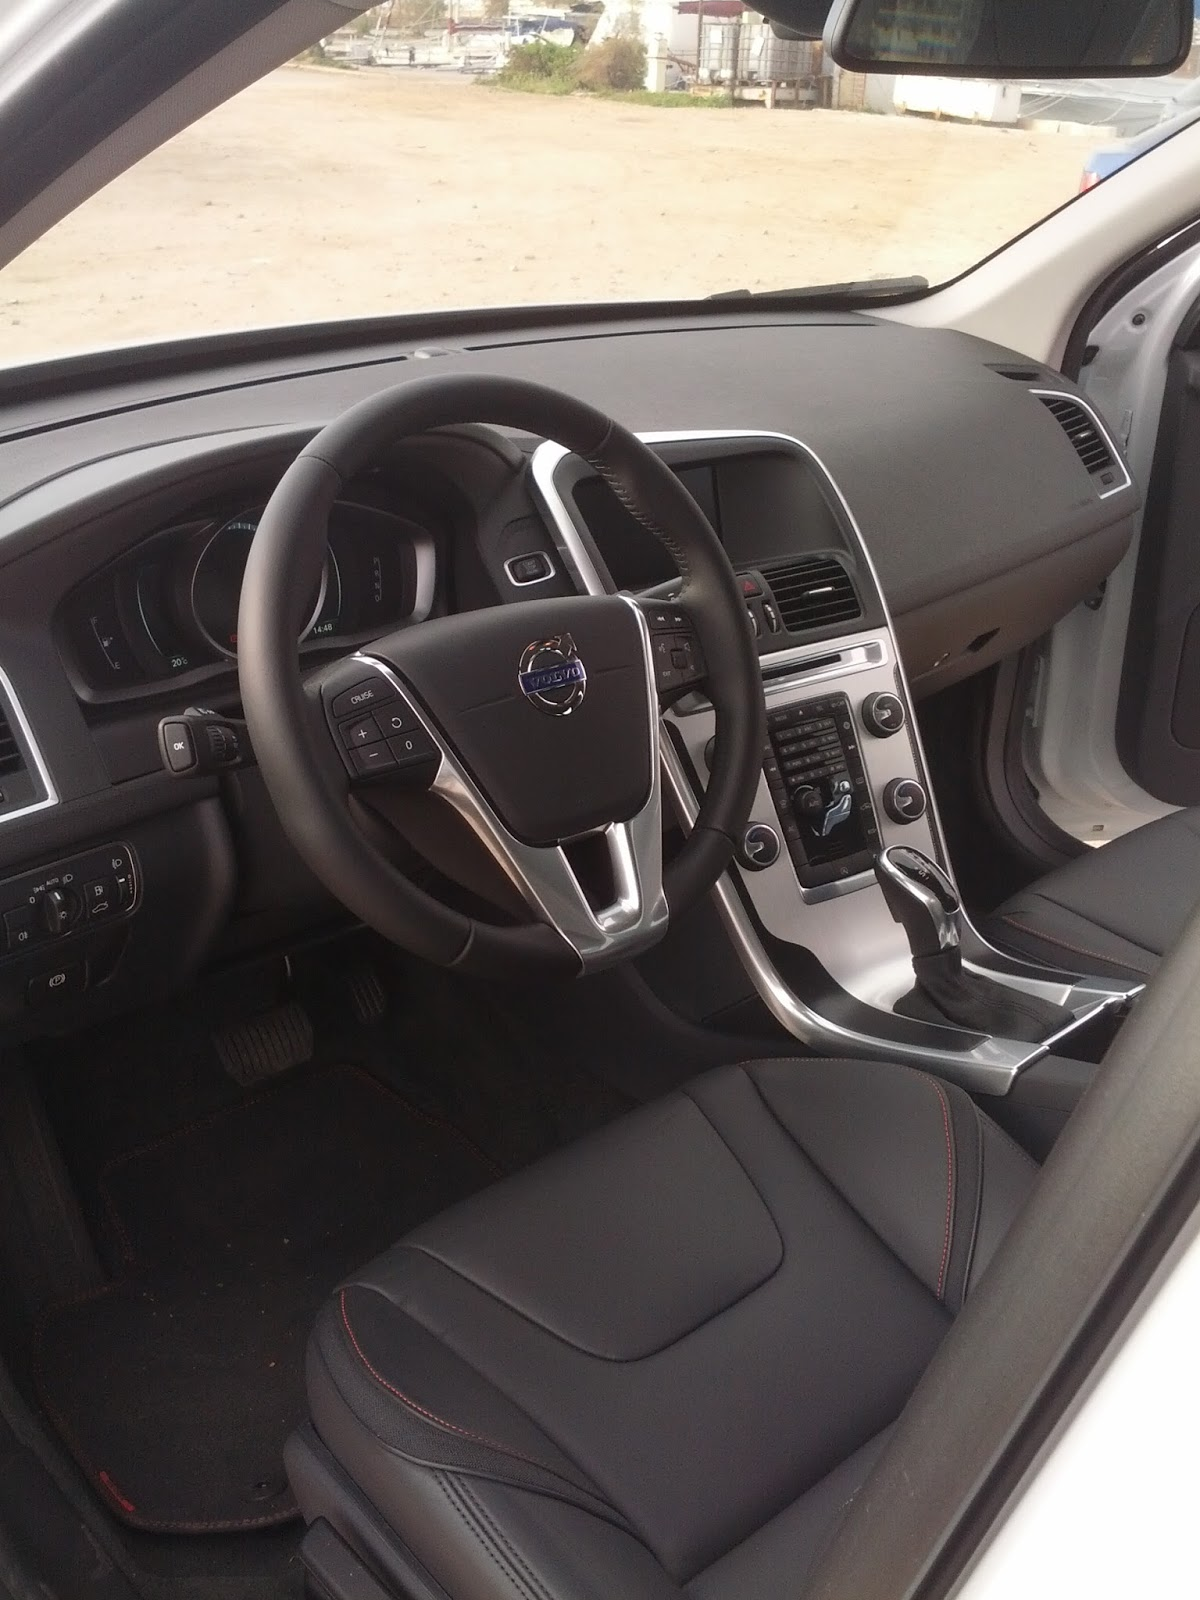 IMG 20151209 144642 Γιατί το Volvo XC60 είναι εθιστικό